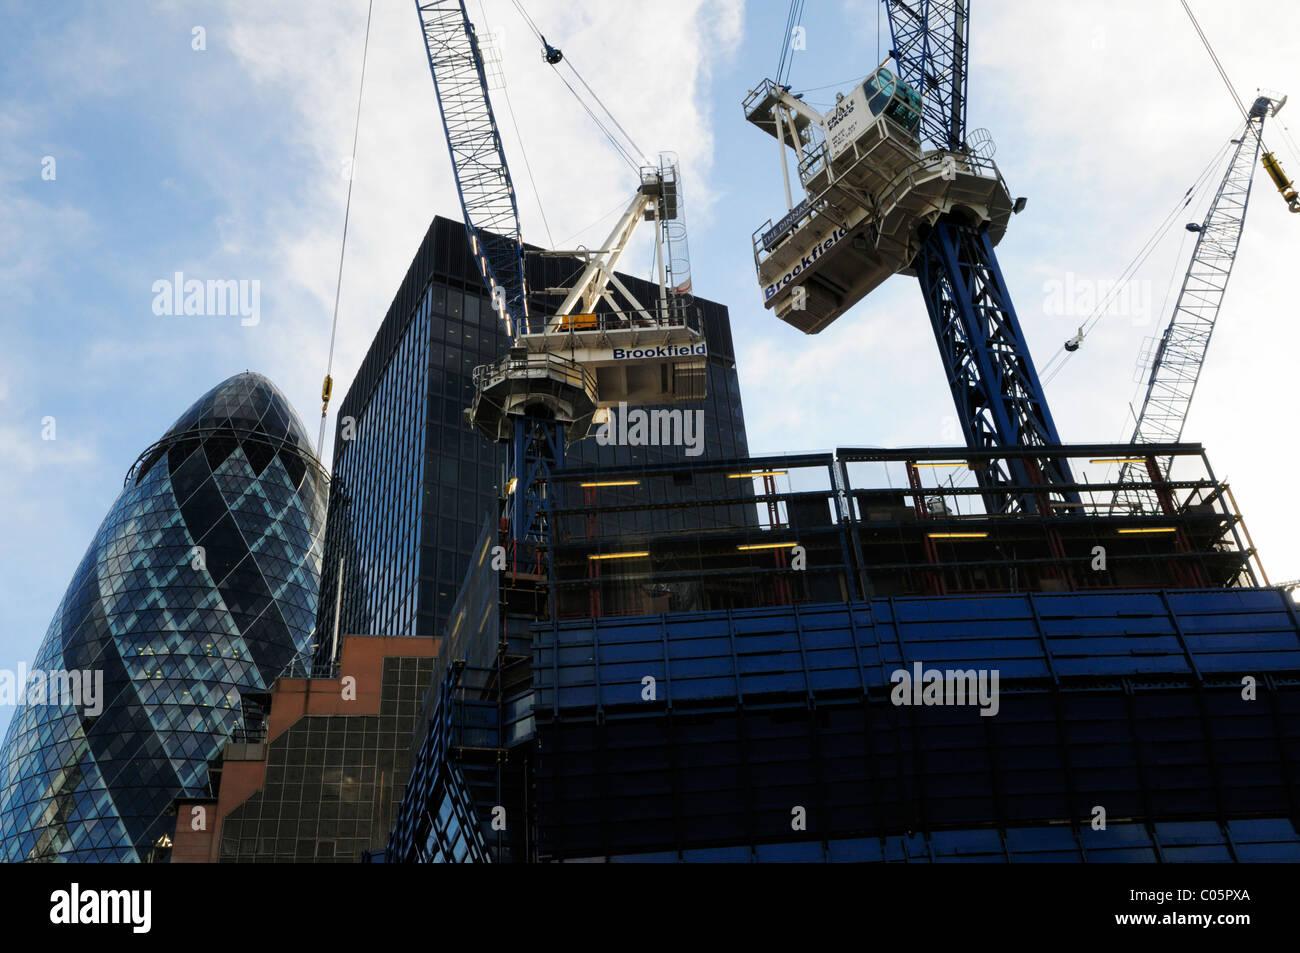 The London Pinnacle Bishopsgate tower building site, Bishopsgate, London, England, UK - Stock Image